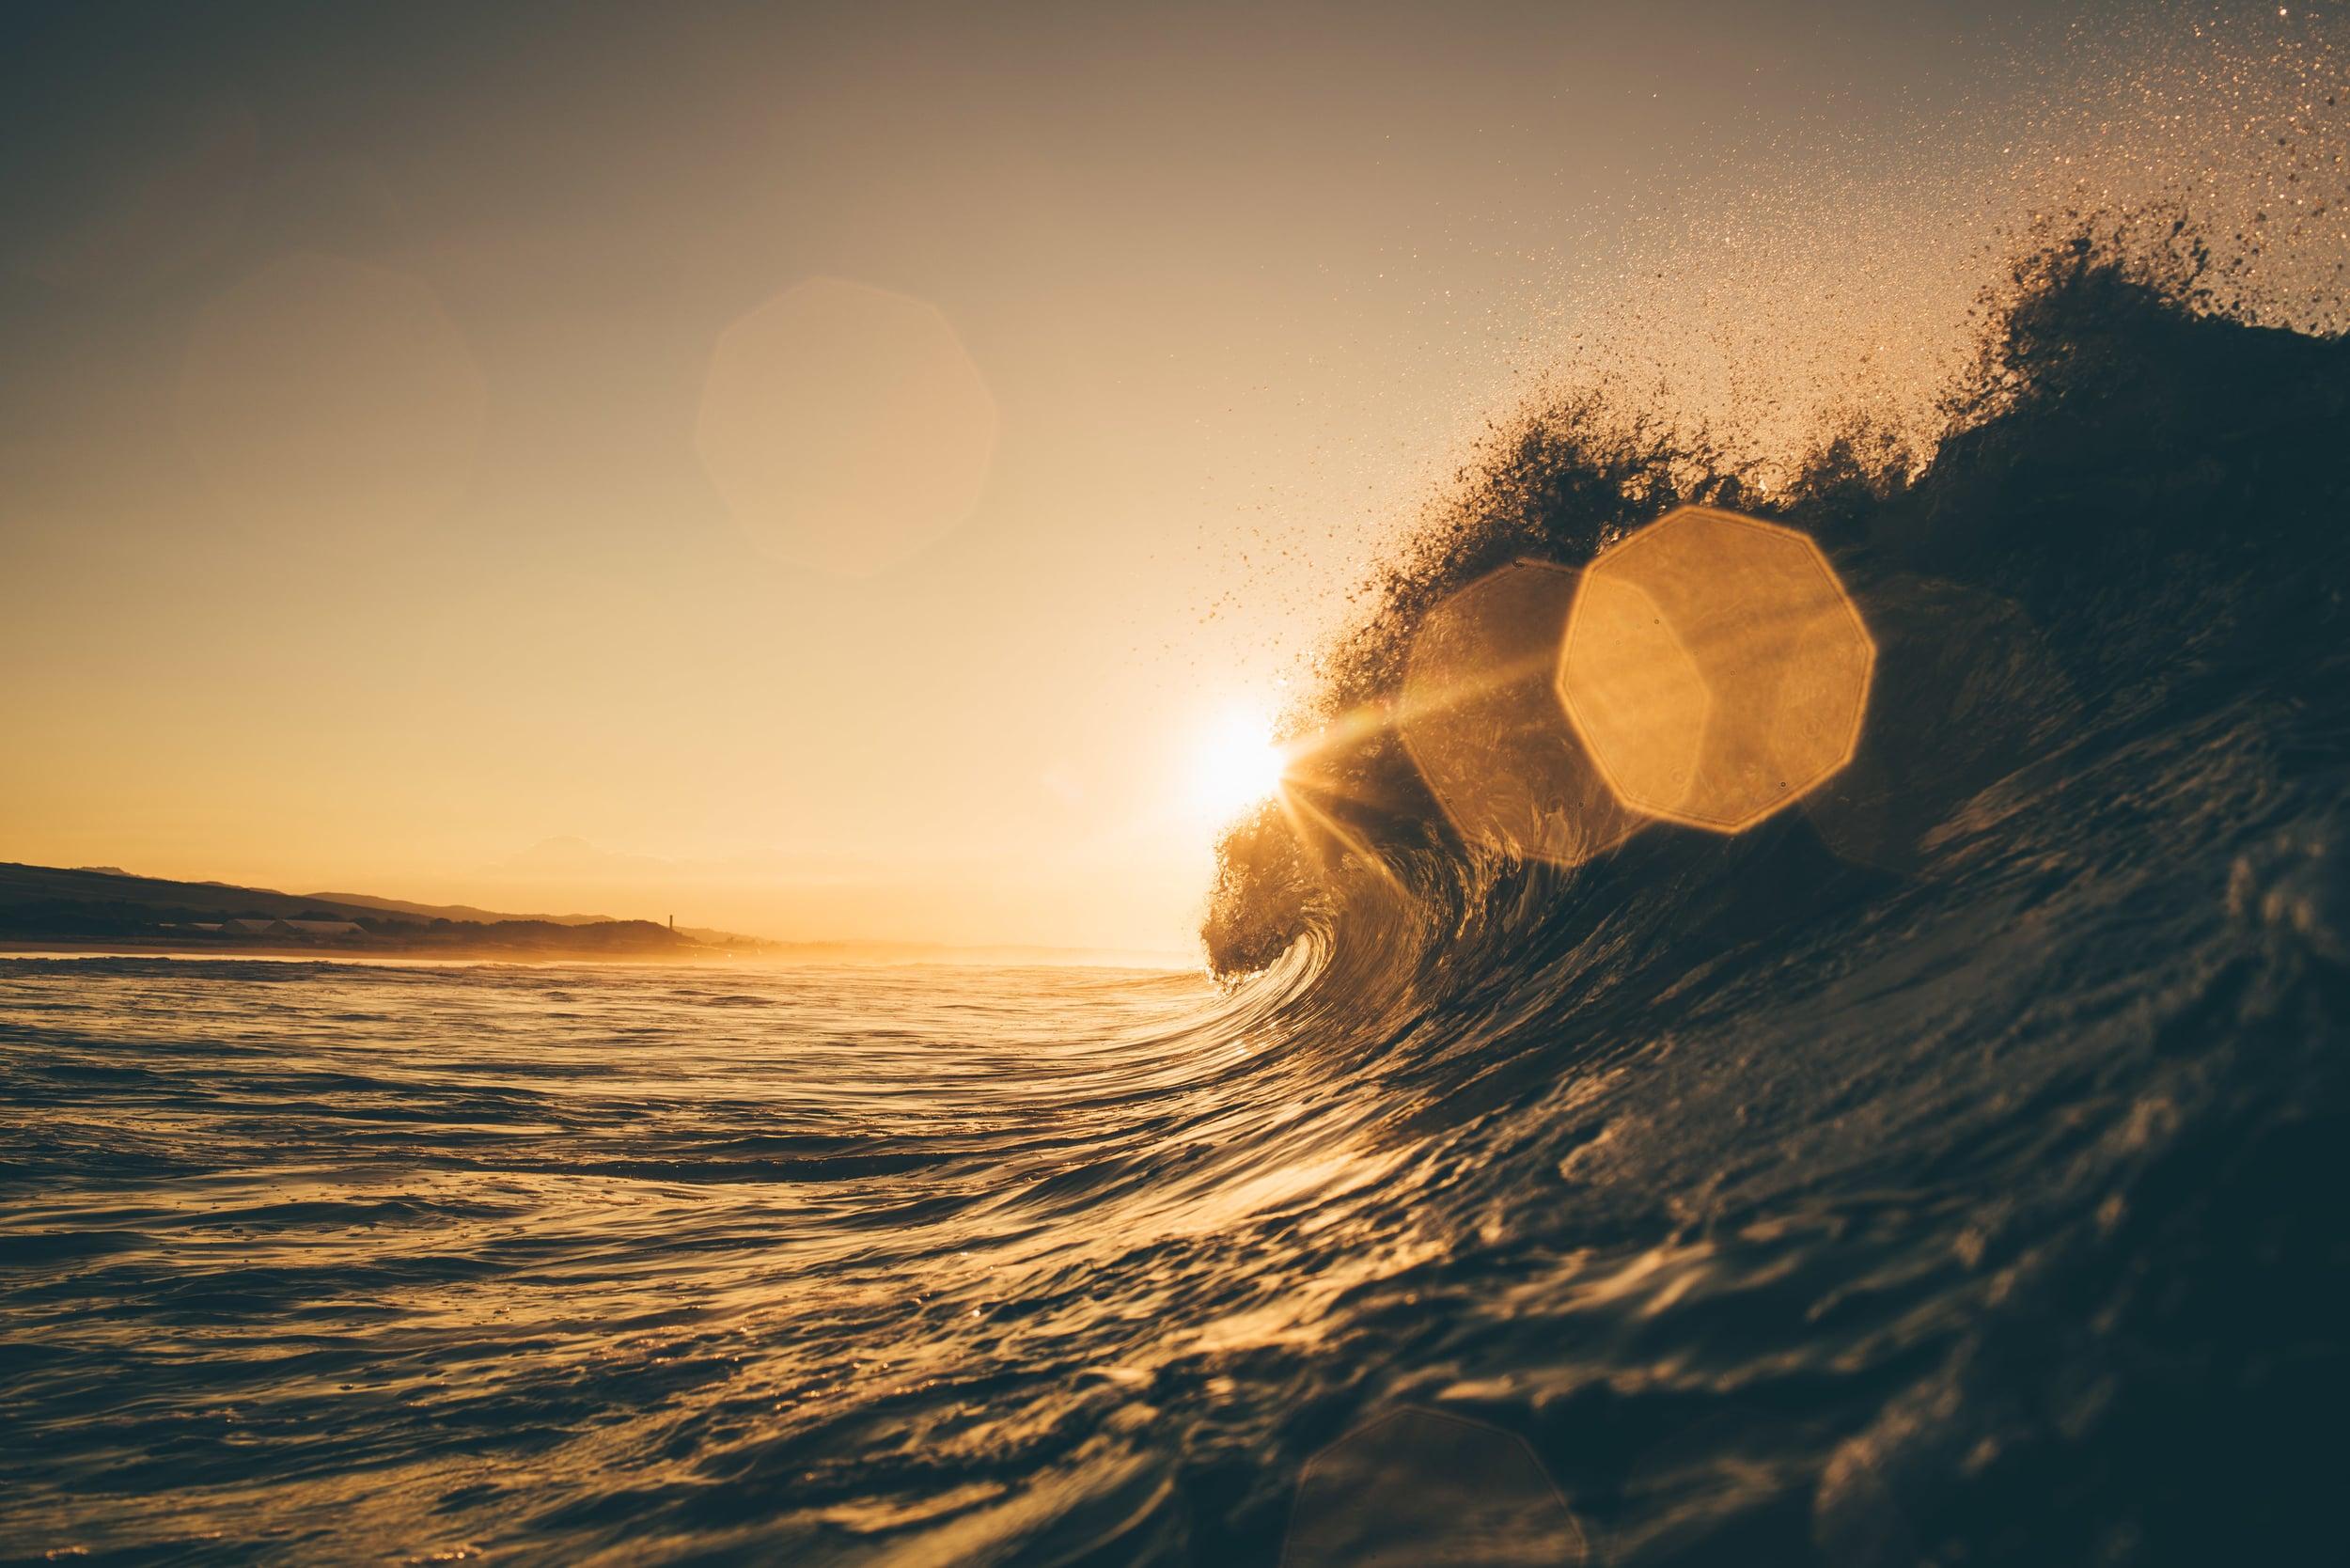 bryce-johnson-photography-kauai-hawaii-surfing-a7rii-aquatech-water-ocean-20.jpg